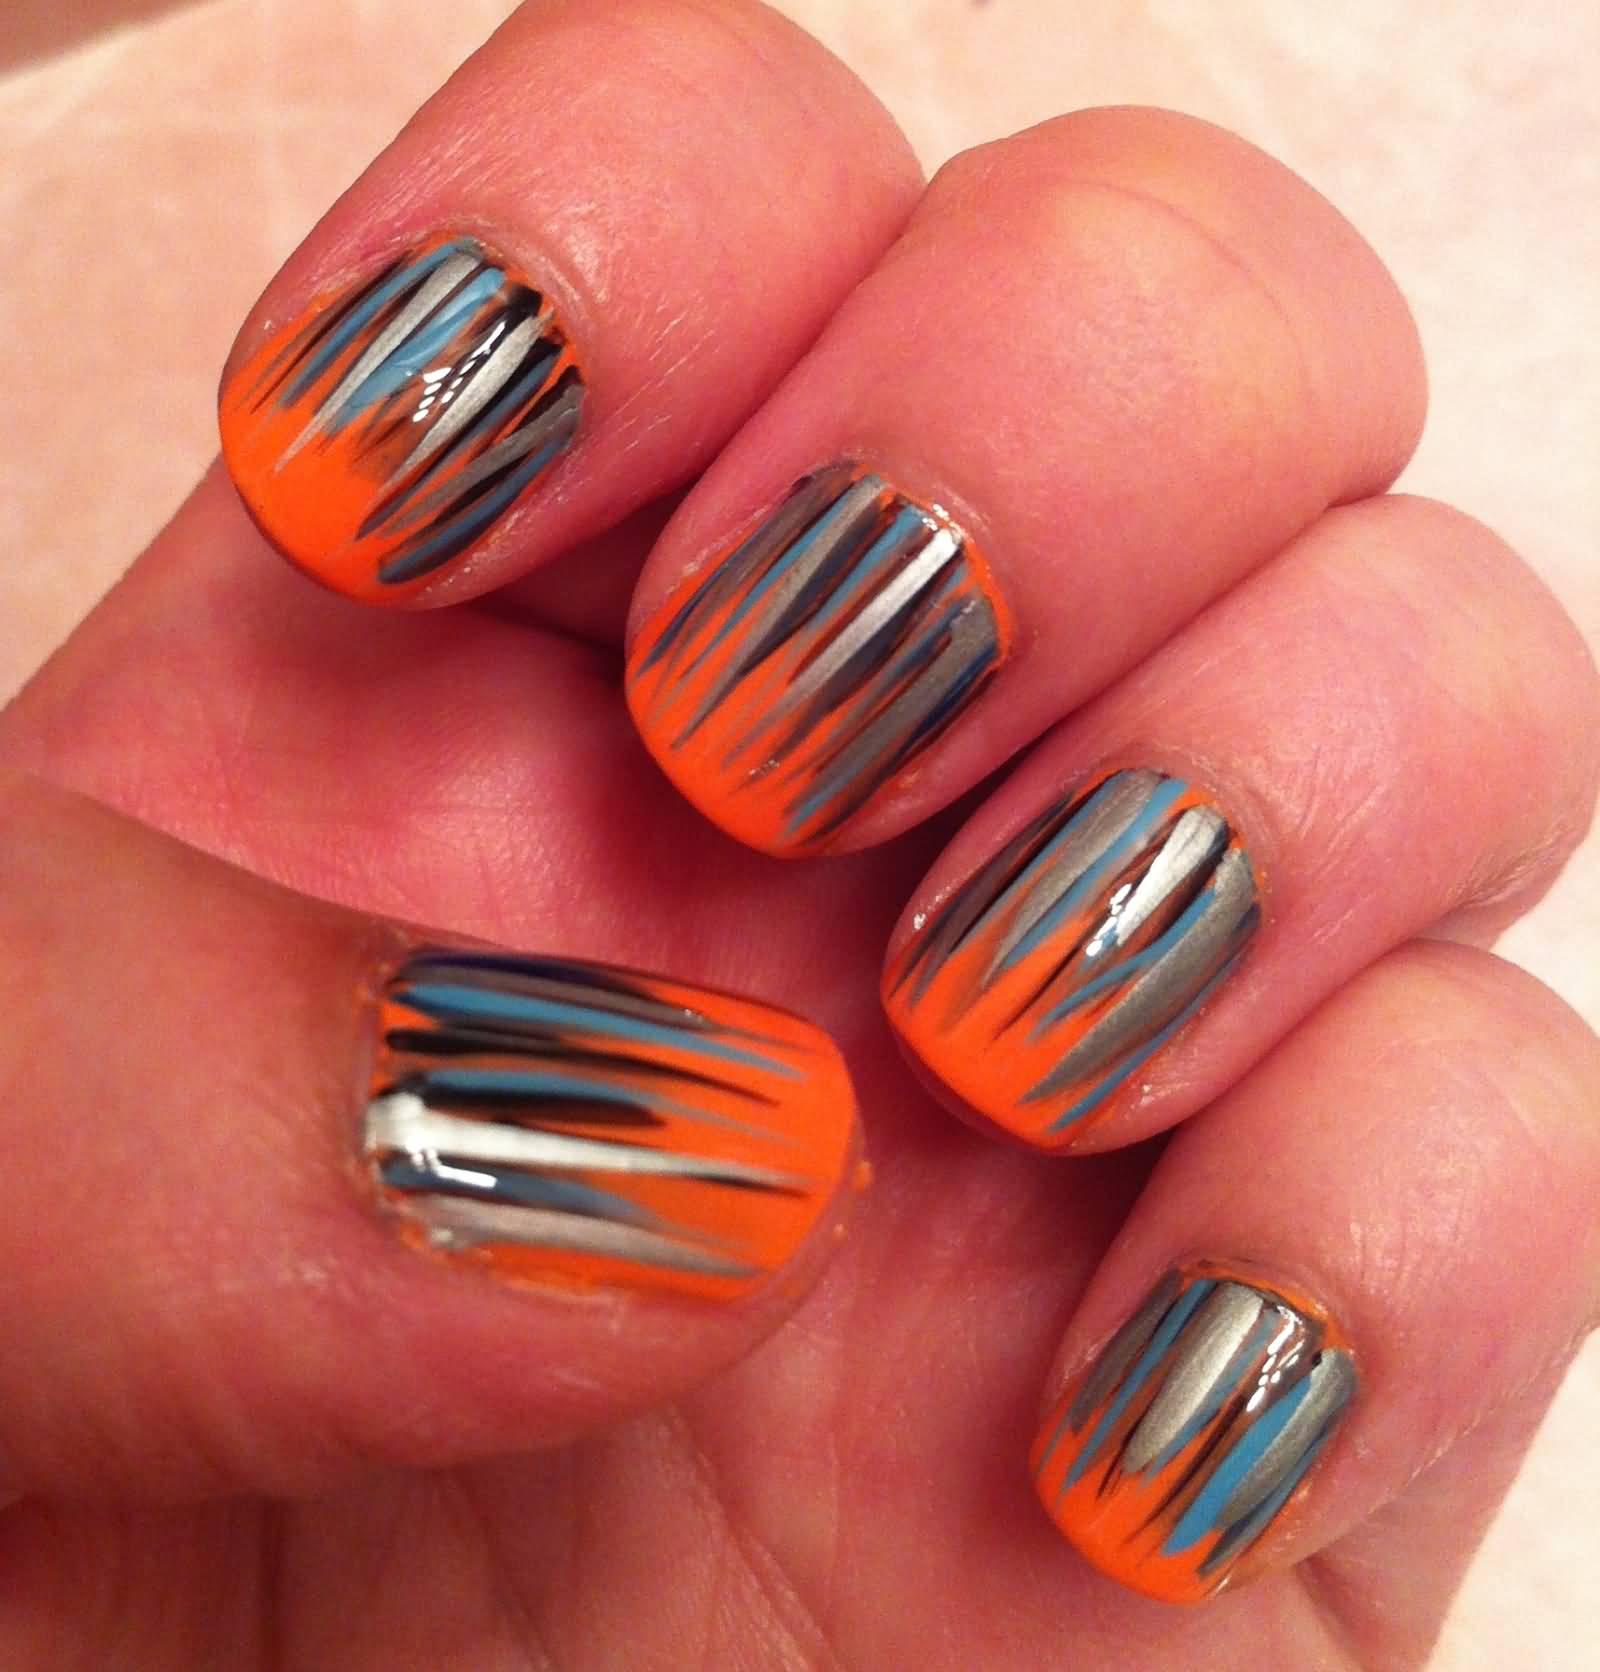 Orange Nails With Grassy Spikes Design Nail Art